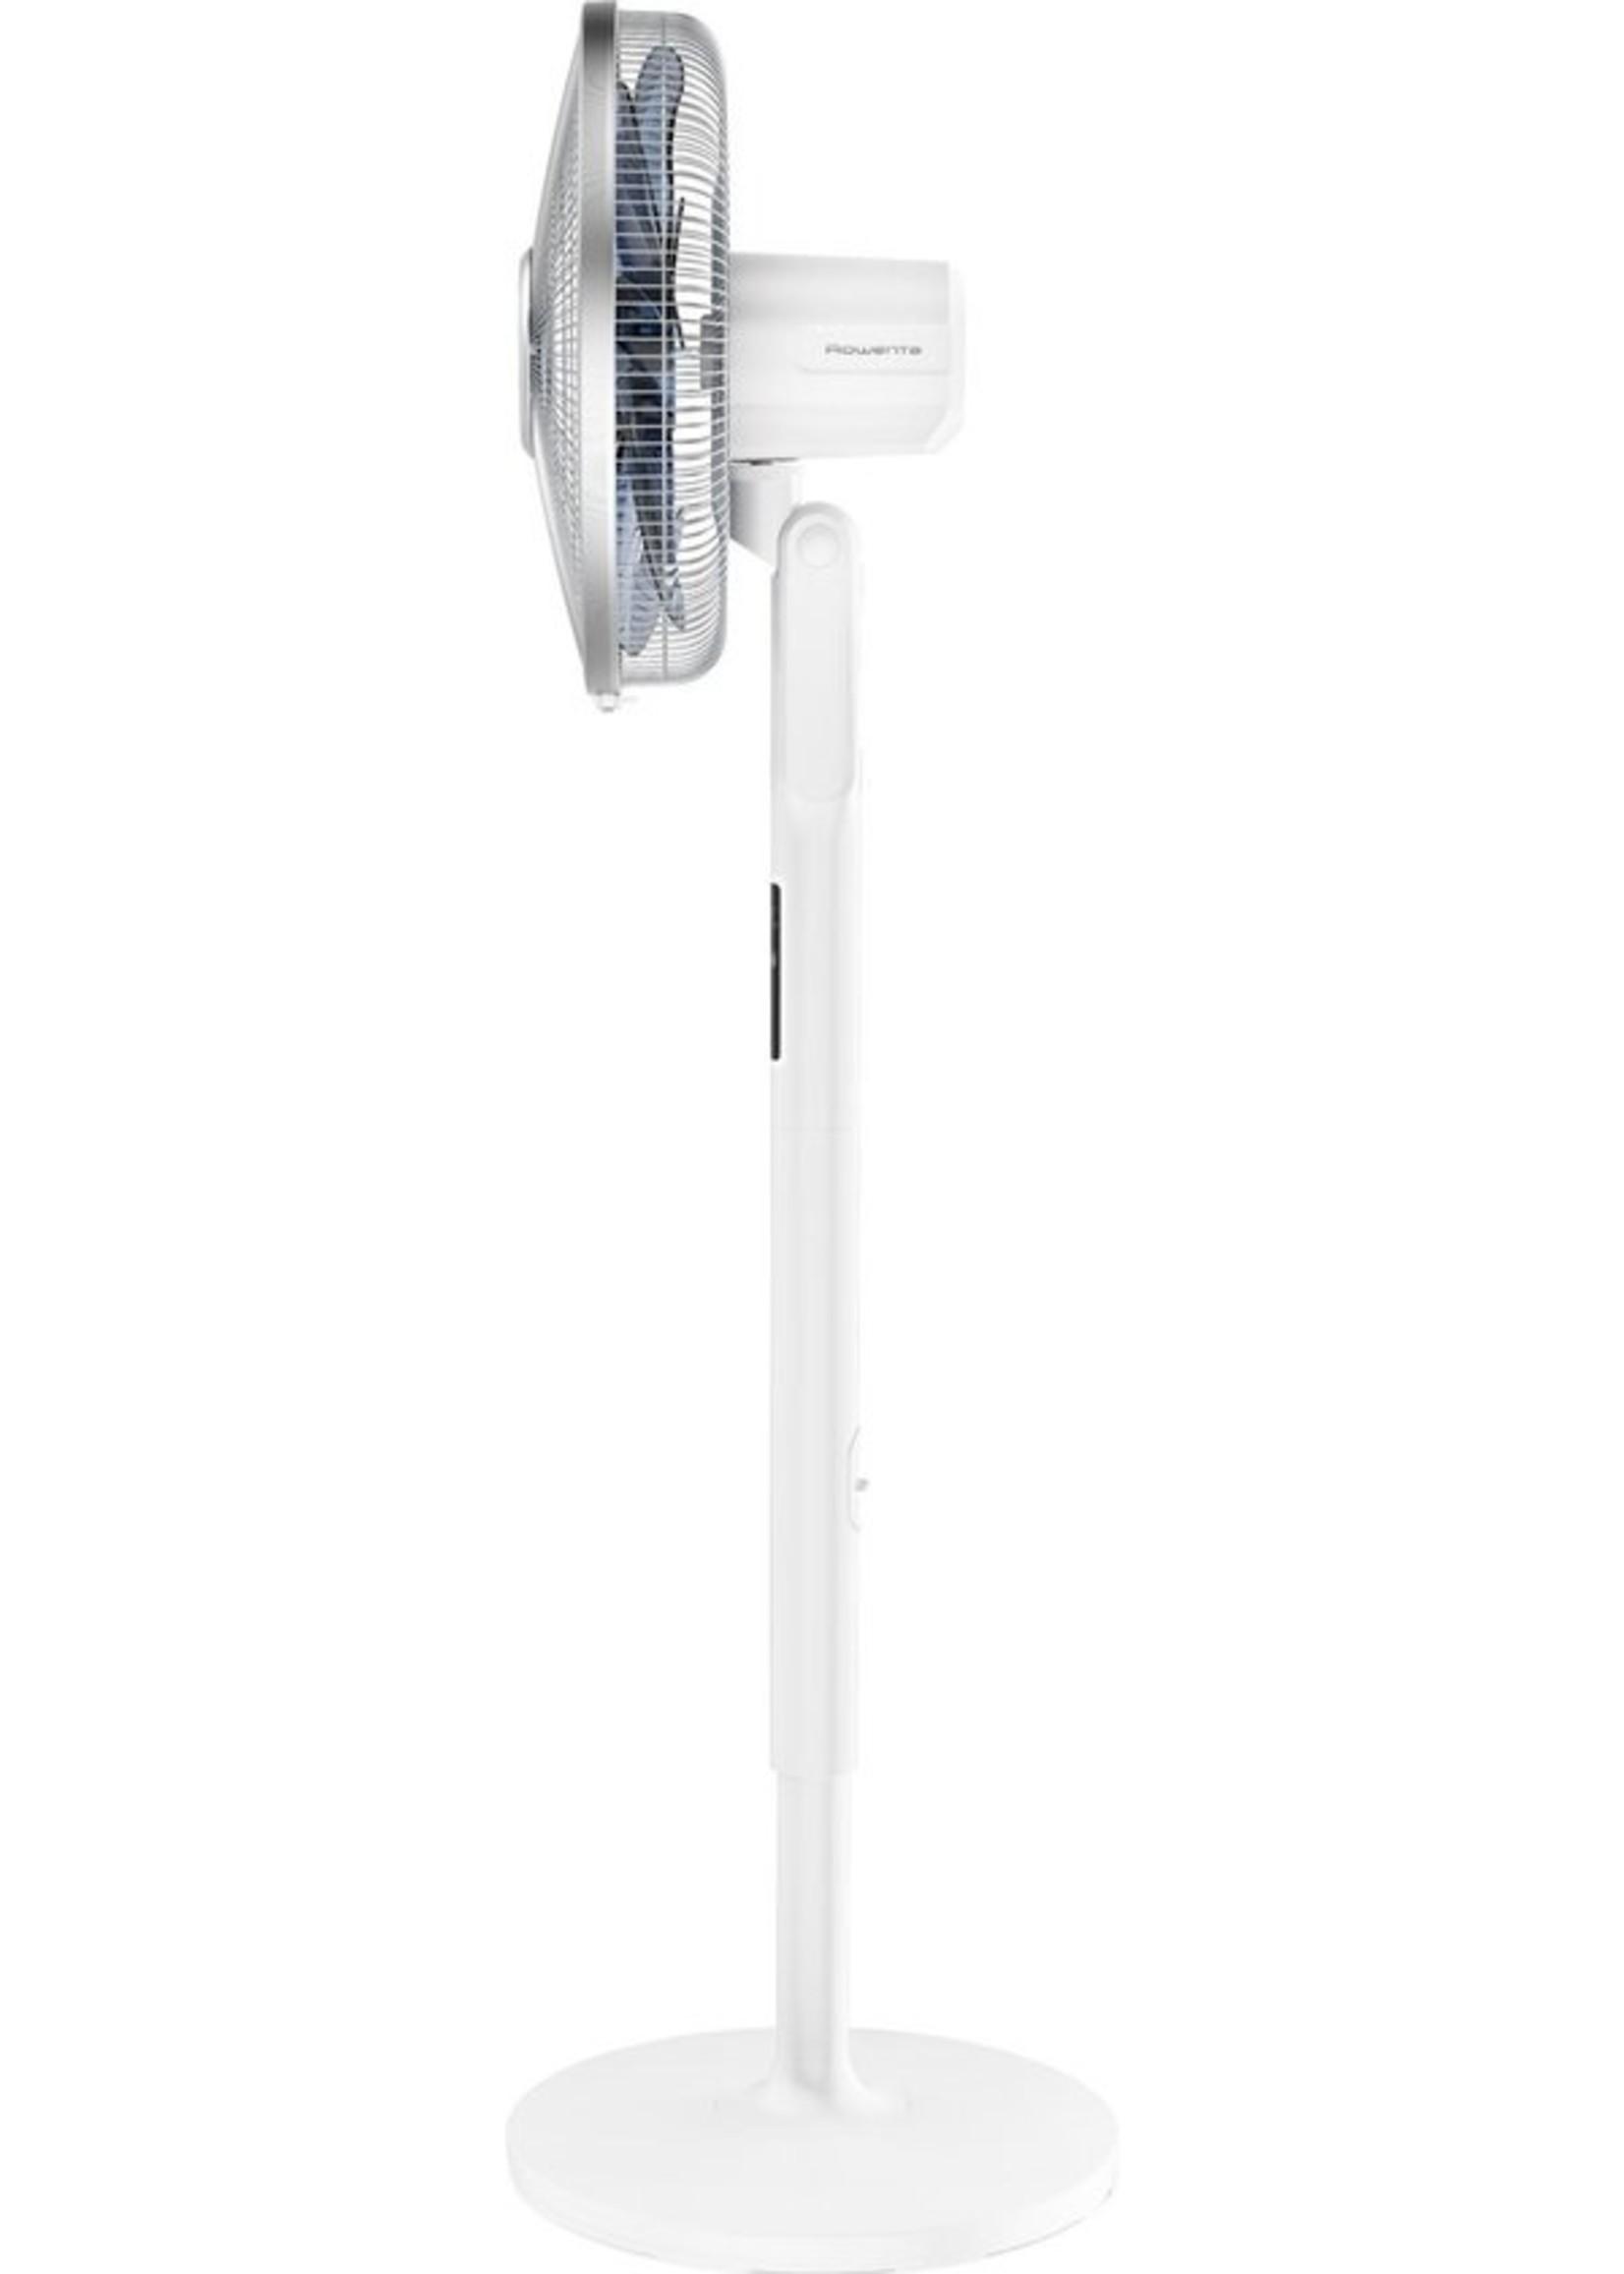 Rowenta Rowenta Turbo Silence Extreme  VU5770F0 - Statiefventilartor - Inclusief timer koopjeshoek